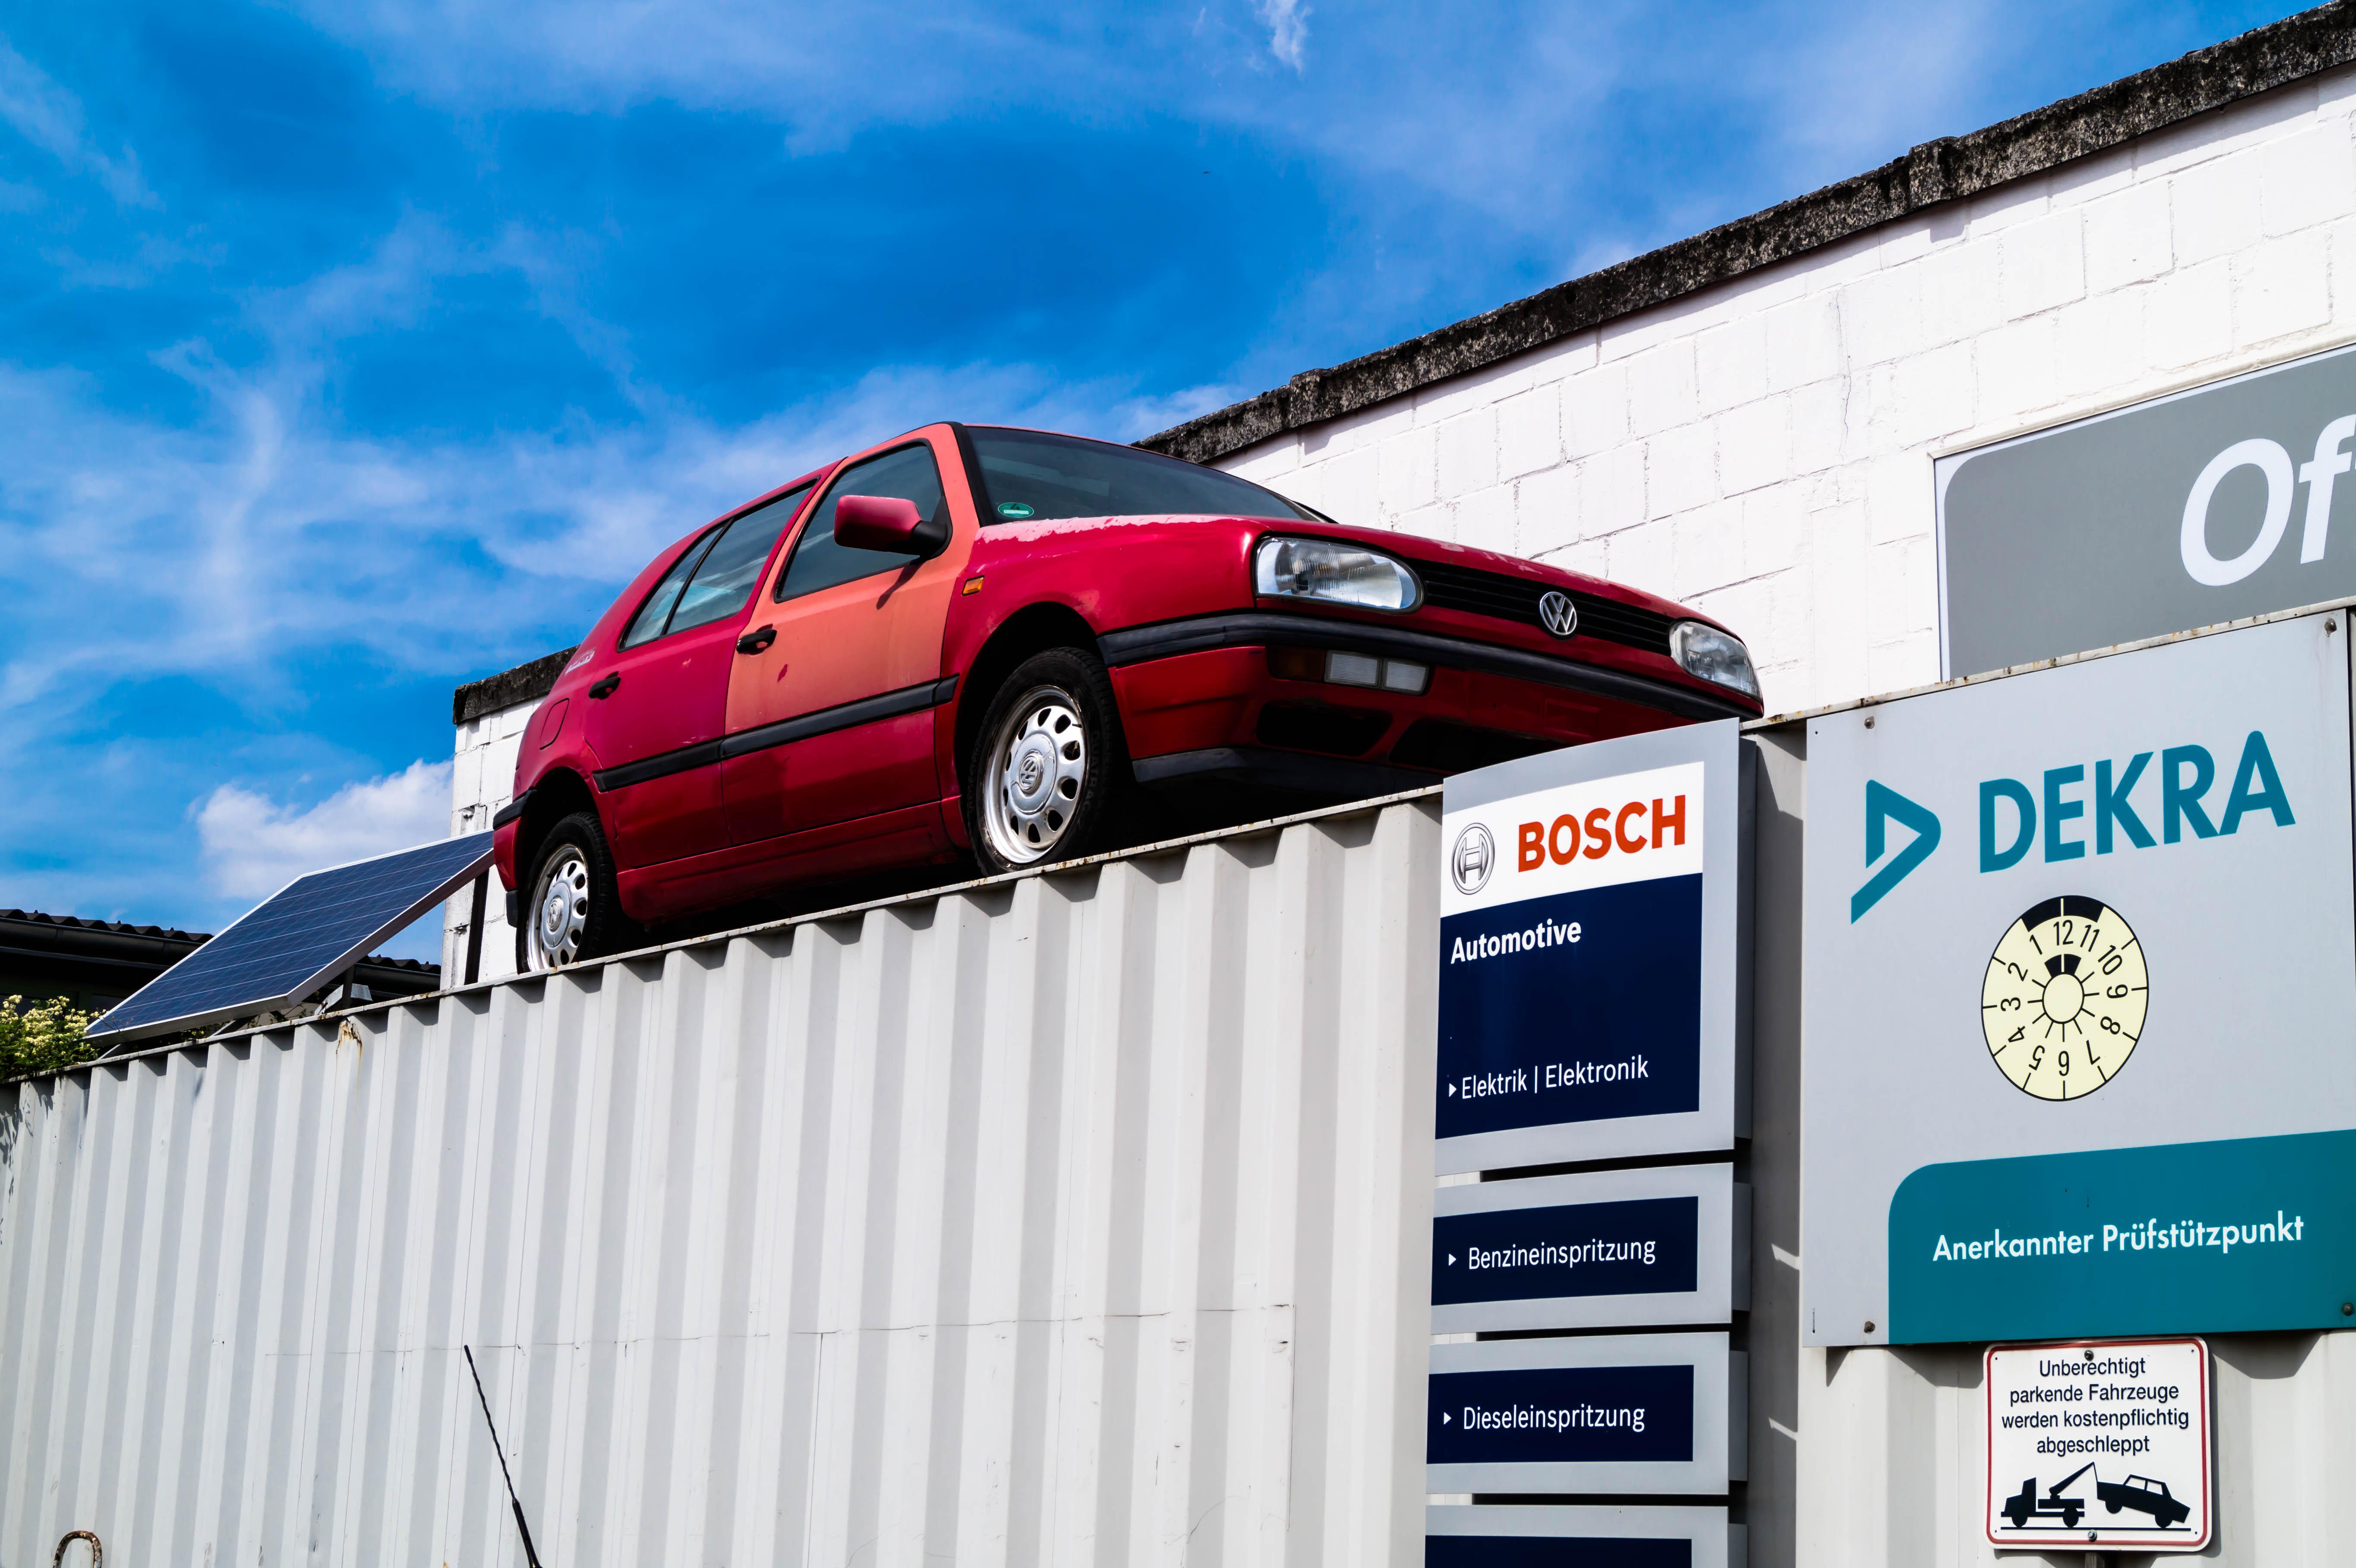 Kraftfahrzeugtechnik Offermann GmbH